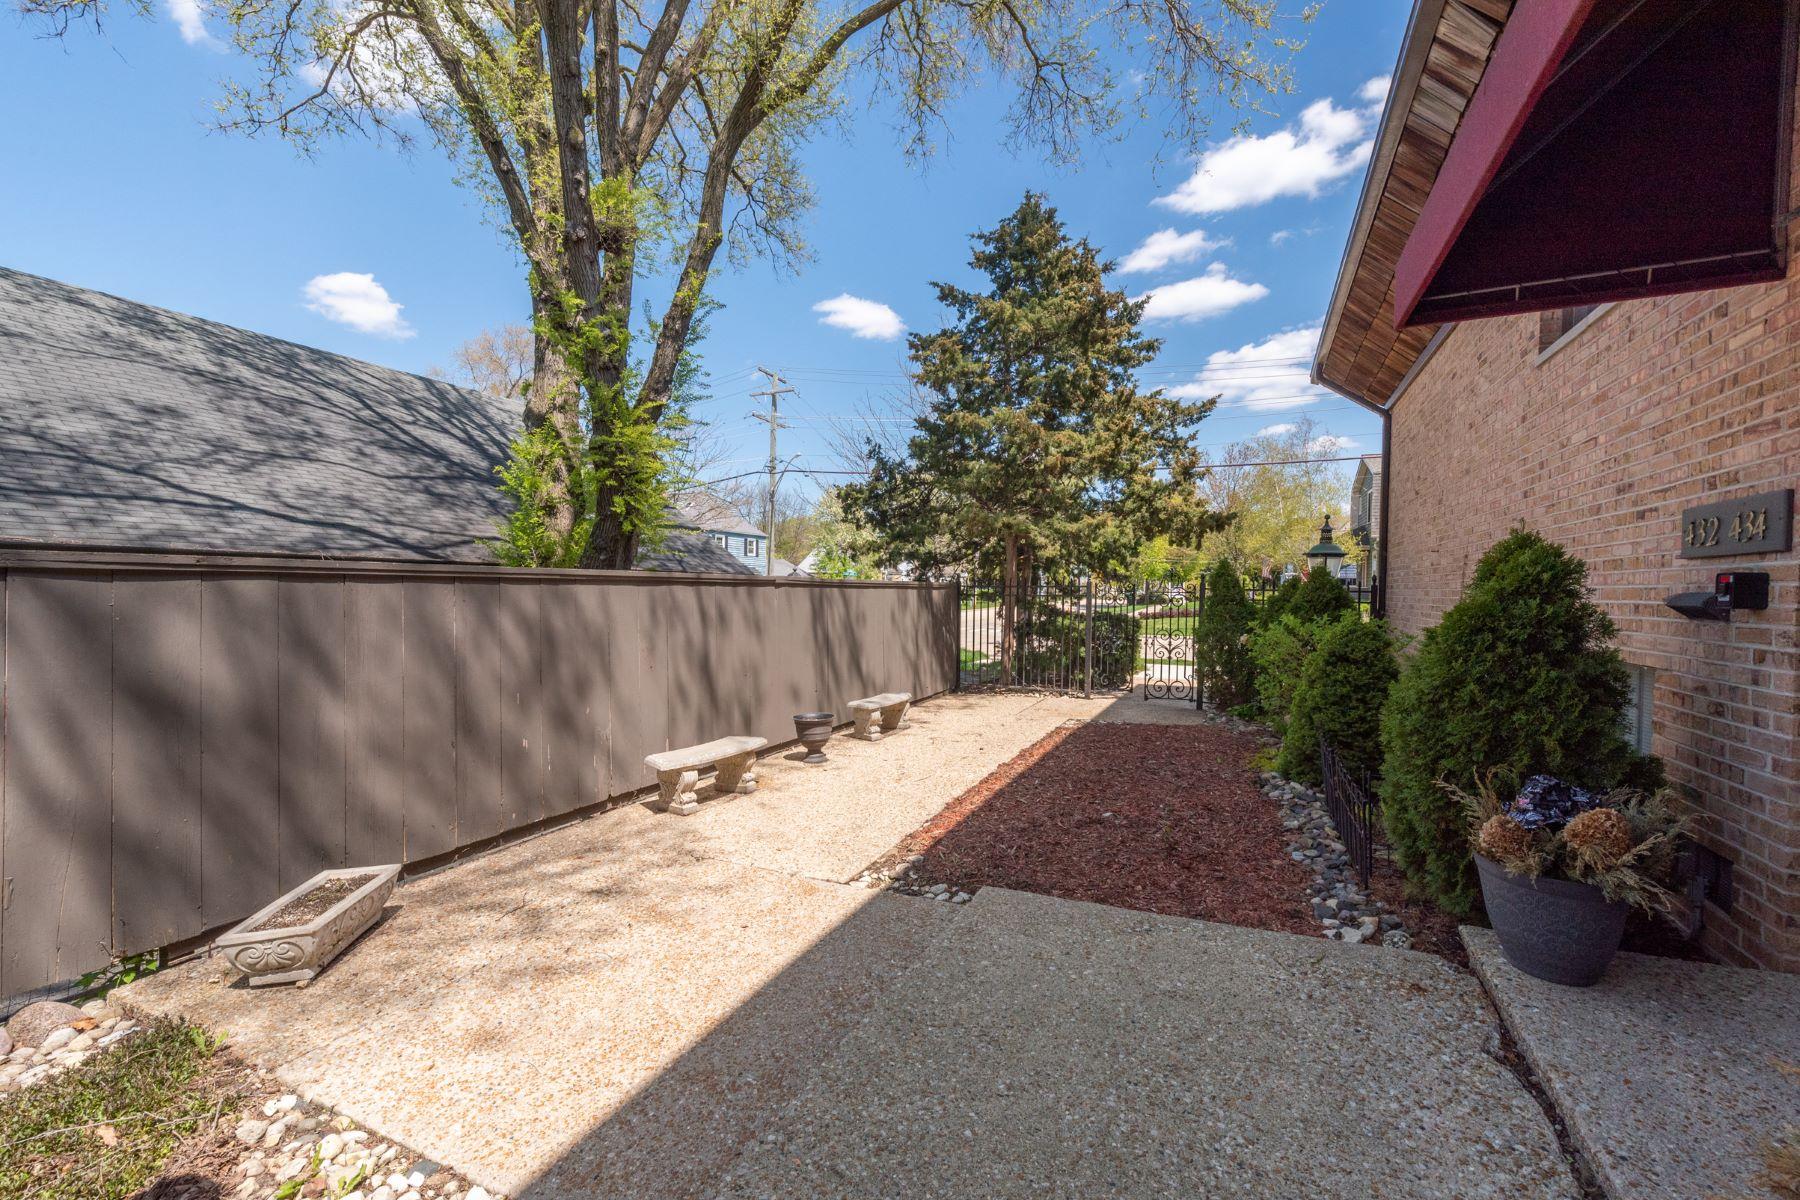 Single Family Homes για την Πώληση στο Upgraded Top Floor Condo in the Village of Barrington 438 Lageschulte Street Unit 3 Barrington, Ιλινοϊσ 60010 Ηνωμένες Πολιτείες